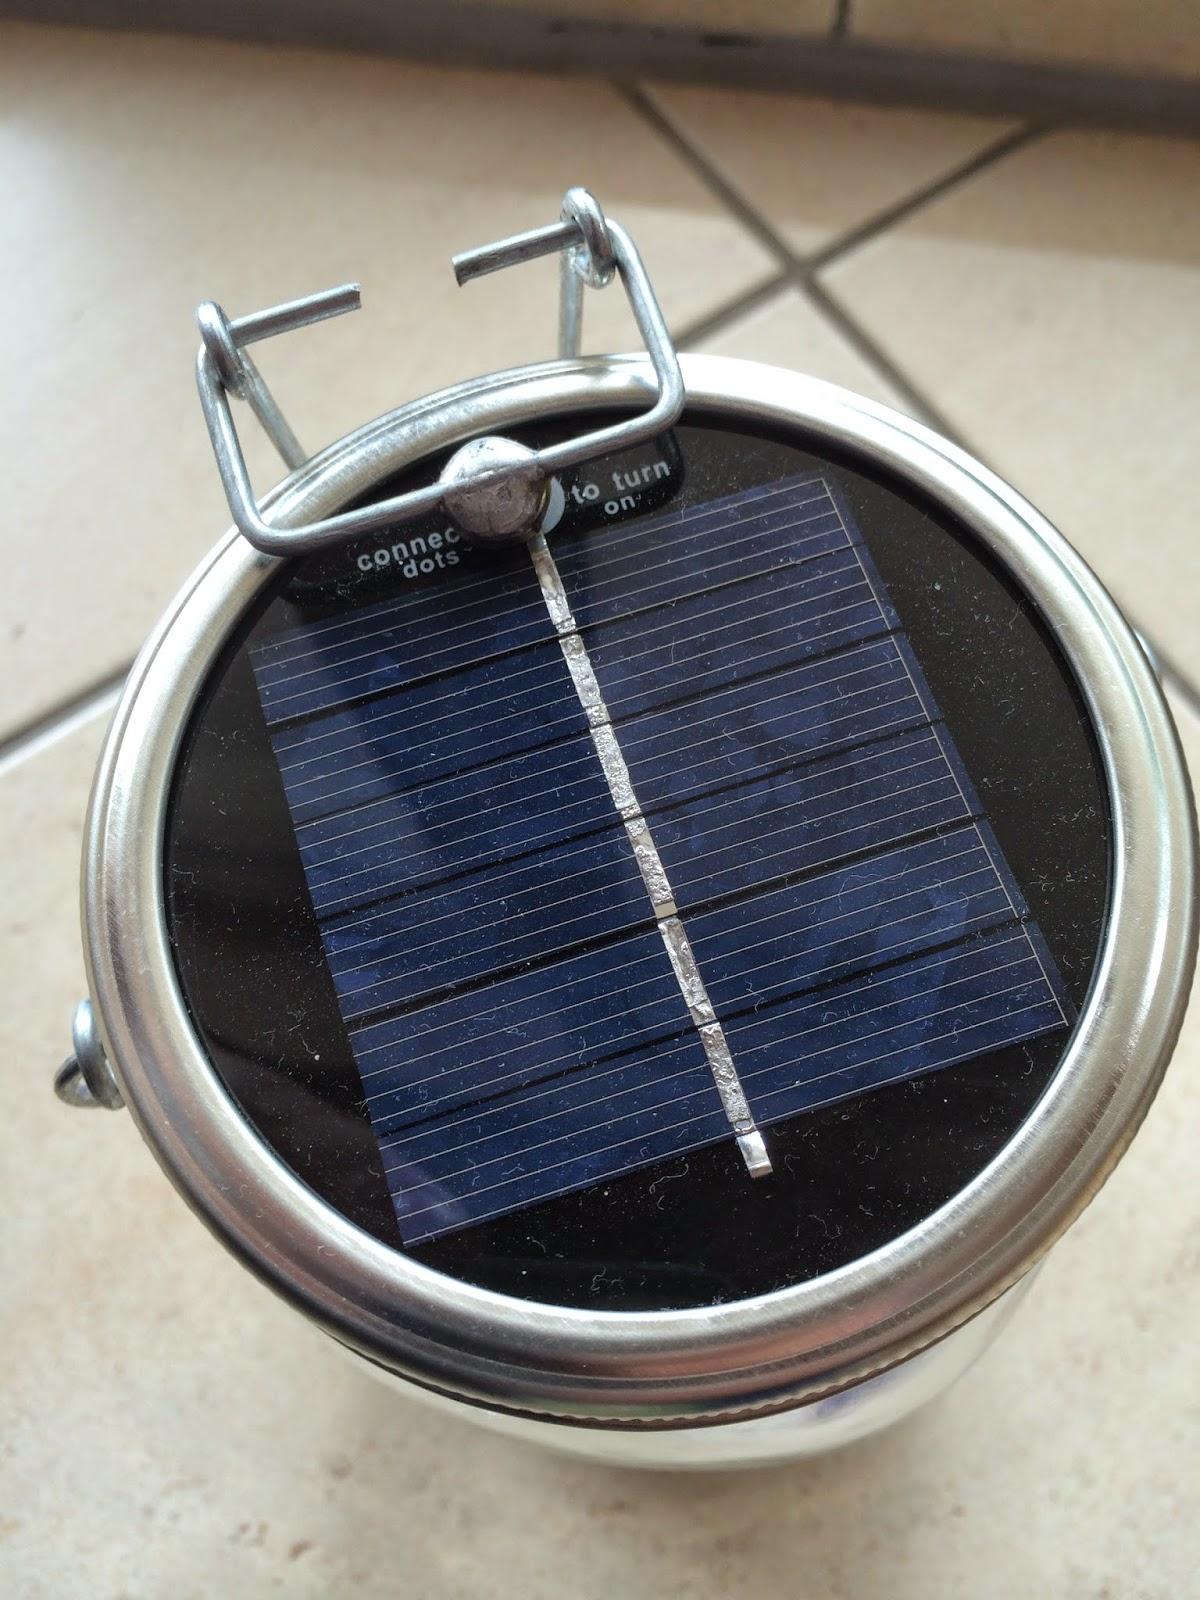 solarlampe selber bauen cmi mit erdspiess erset co sensor selbst bauen fr comessgert mit wlan. Black Bedroom Furniture Sets. Home Design Ideas